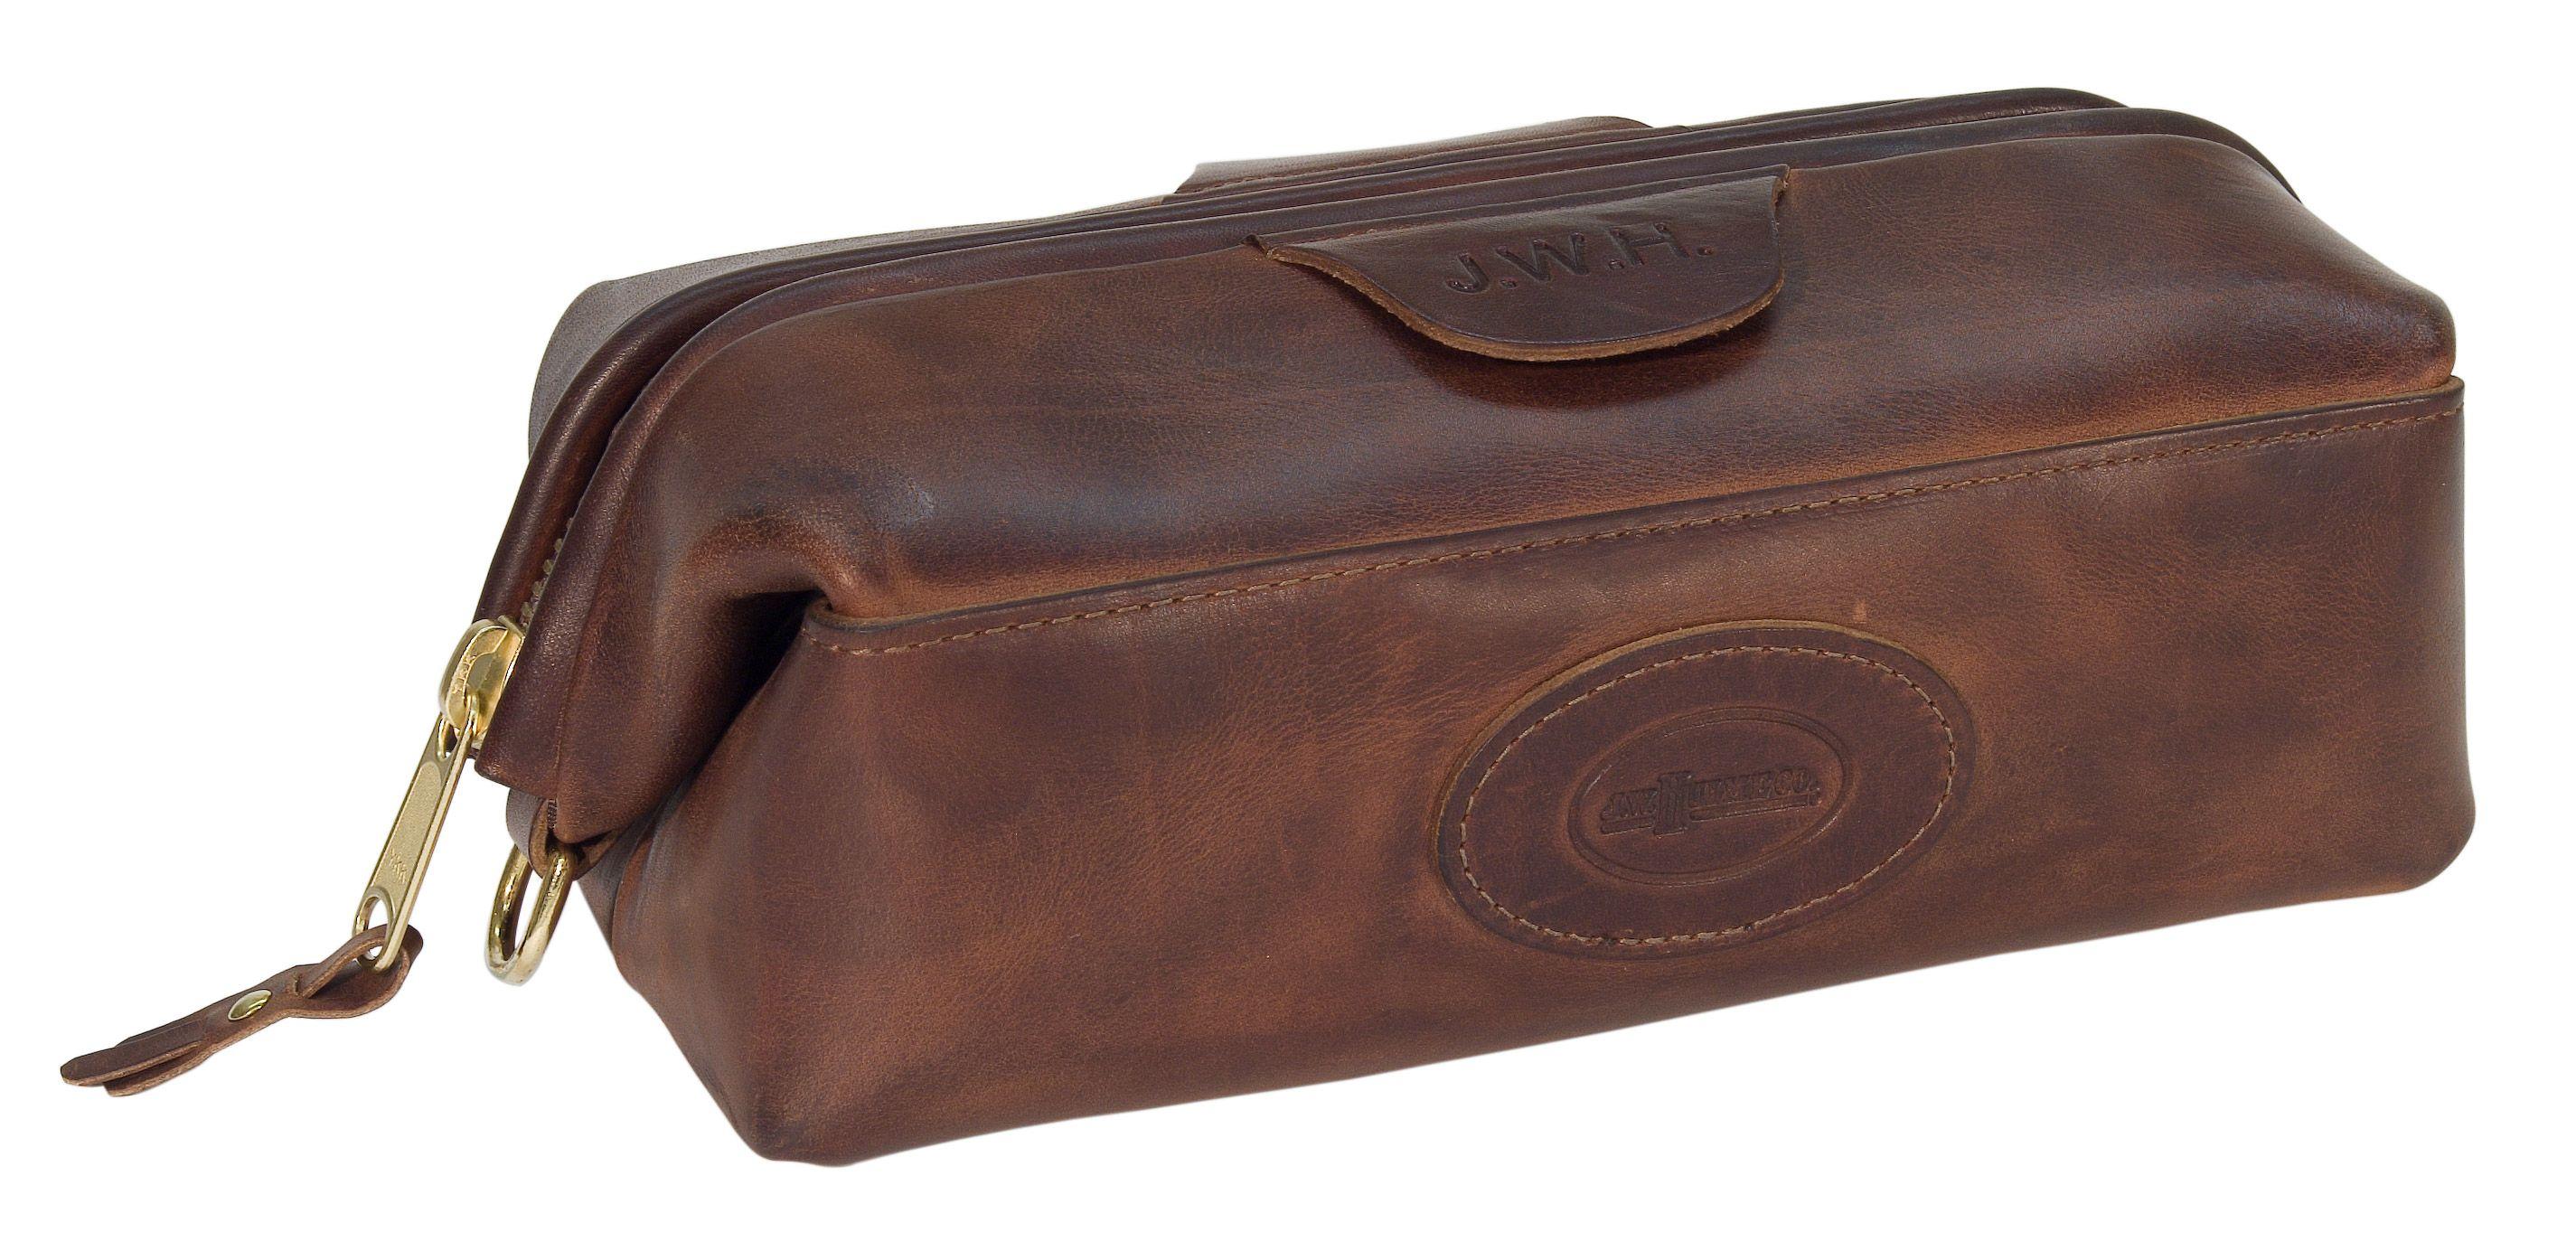 Toiletry Bag Bags Travel Man